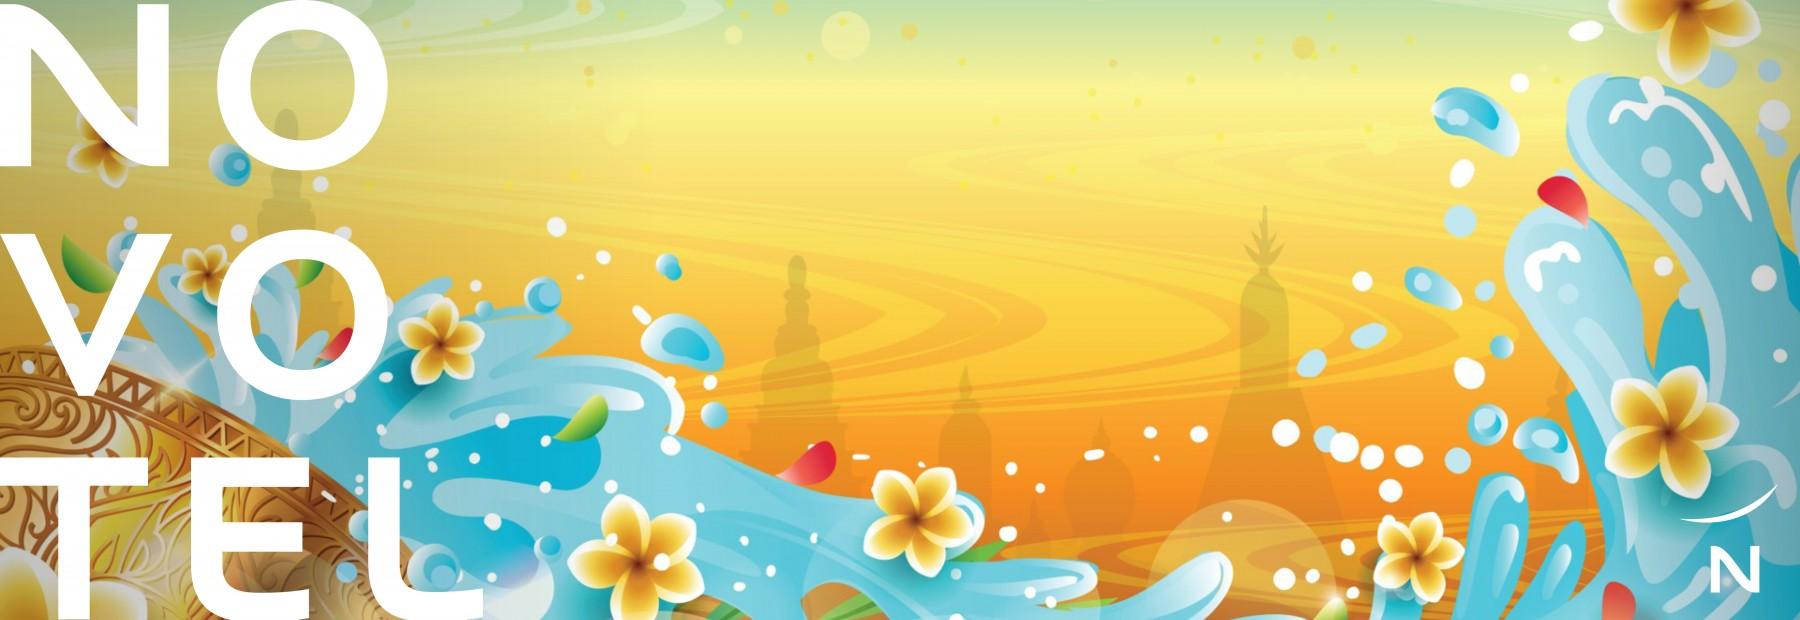 songkran-thai-new-year-festival